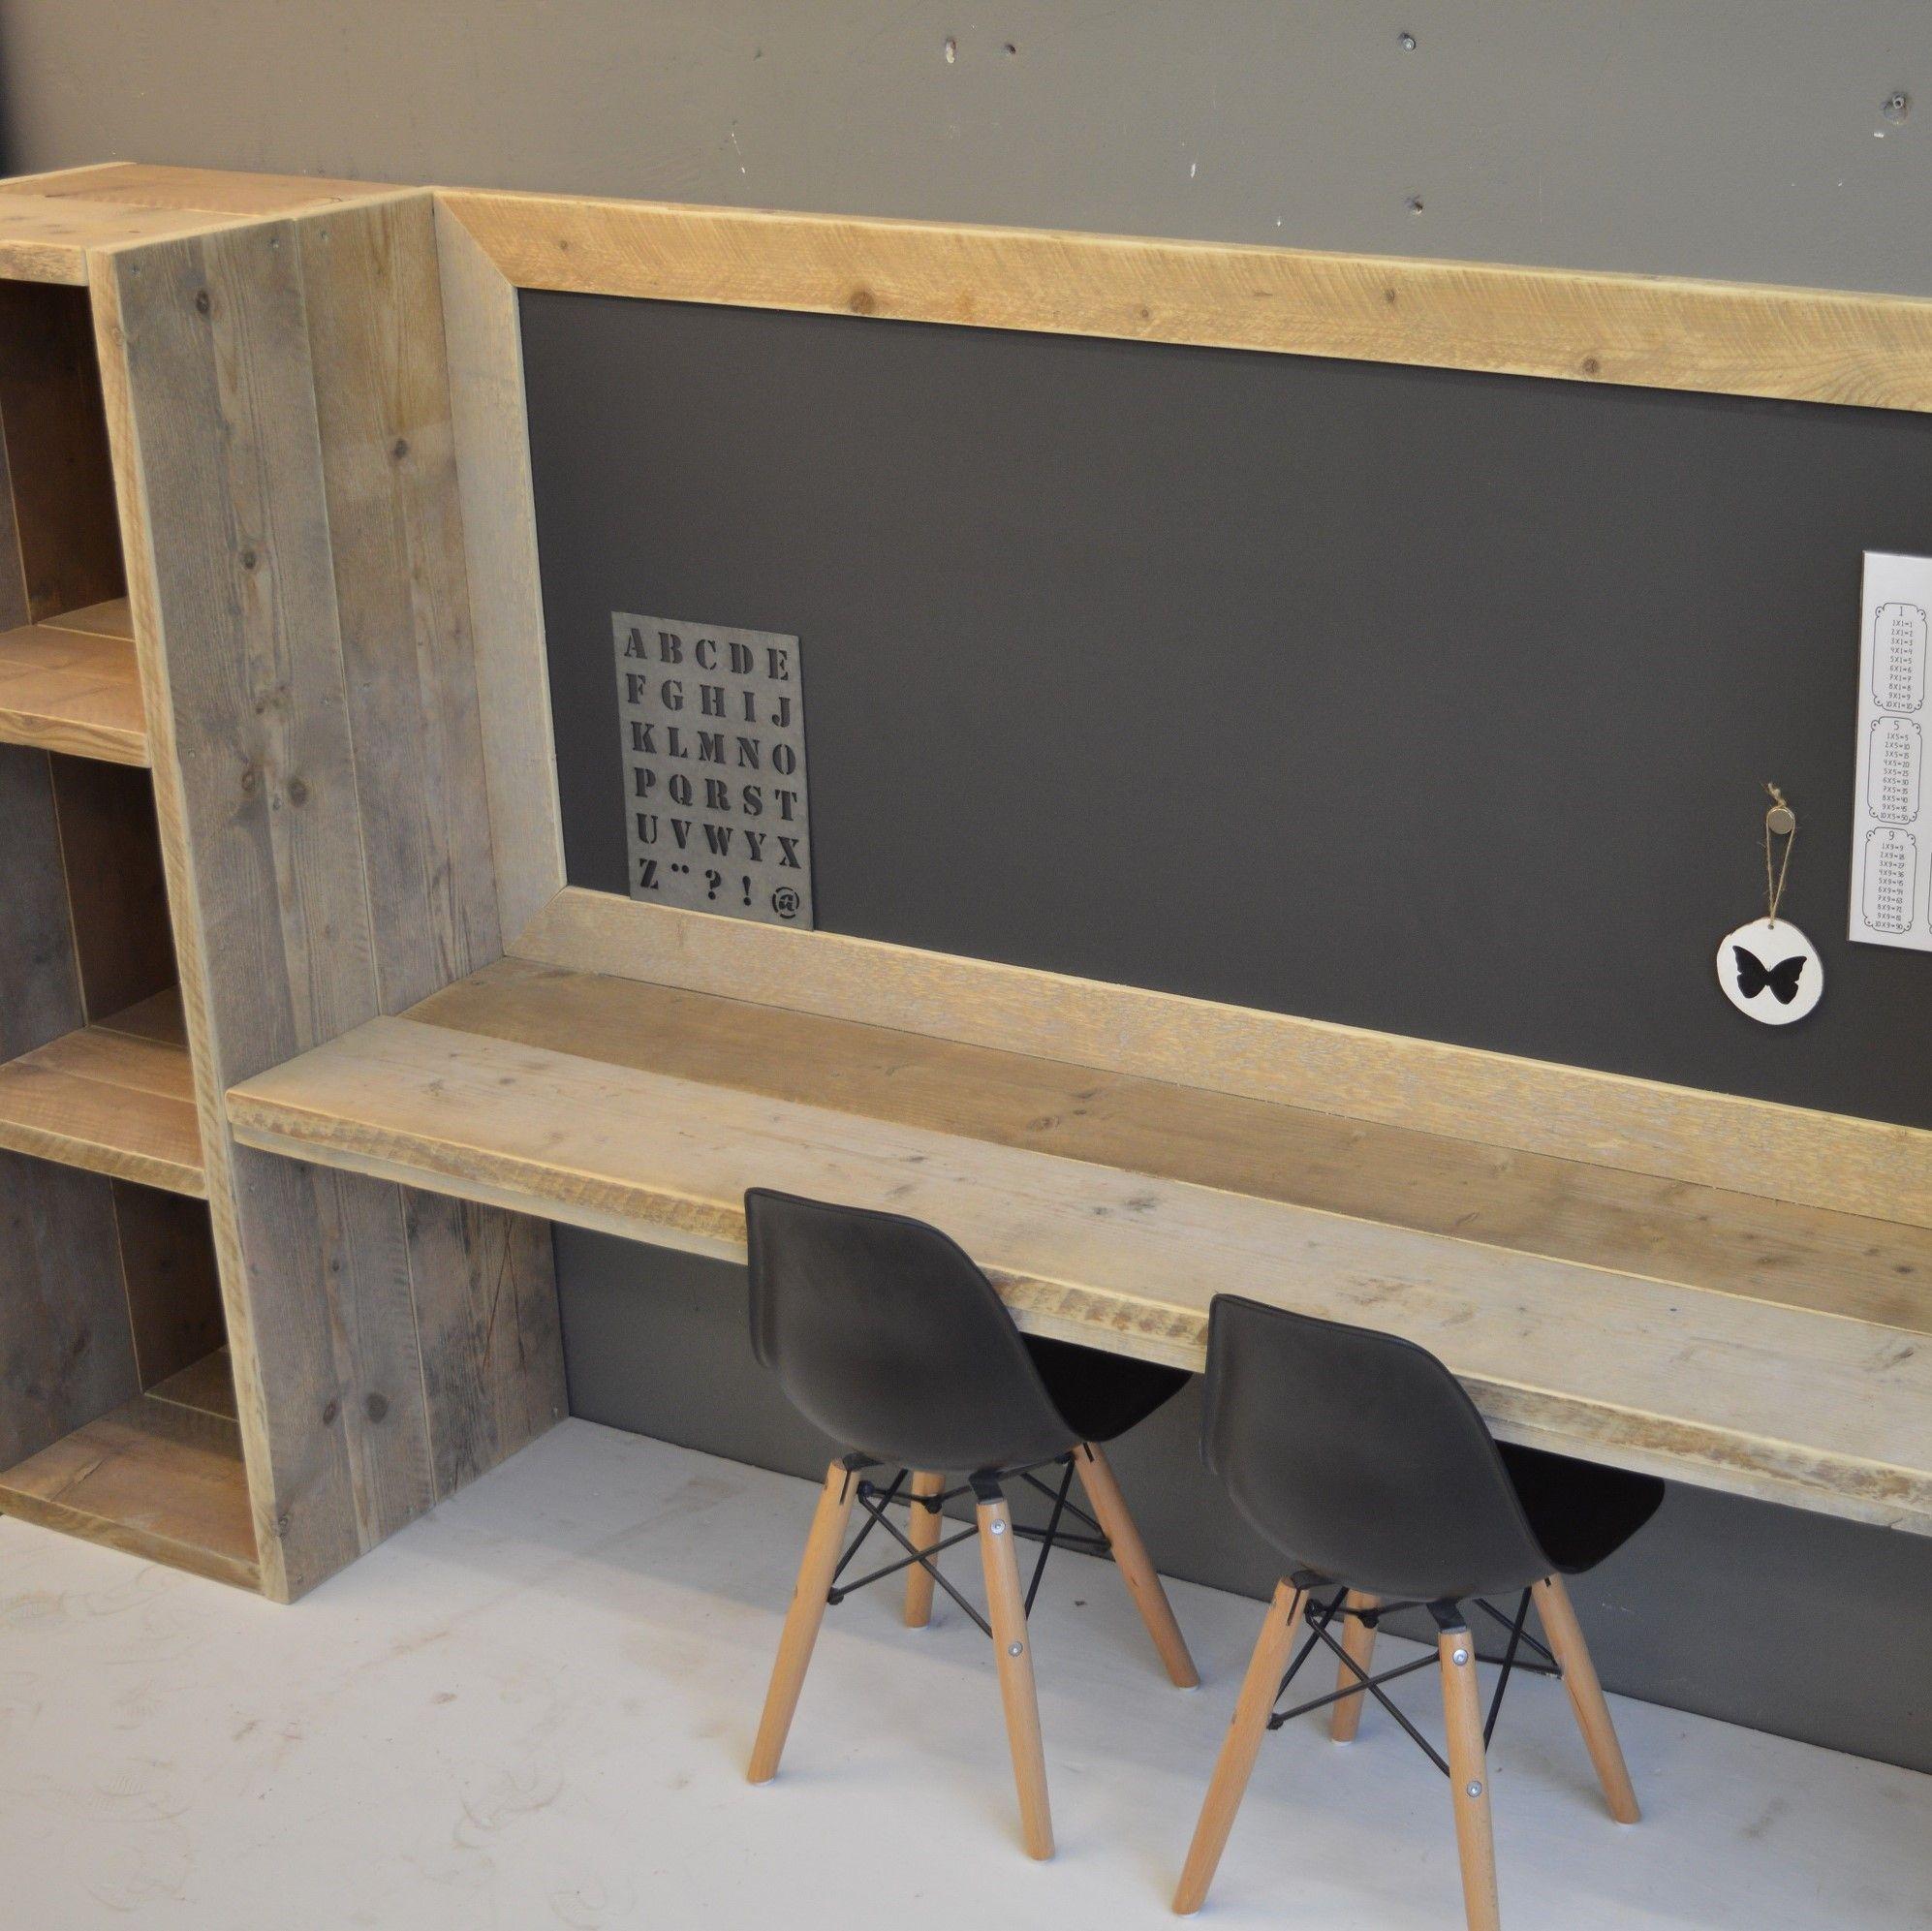 Speeltafel Met Opbergruimte.Steigerhouten Speeltafel Mike De Frietkroon In 2019